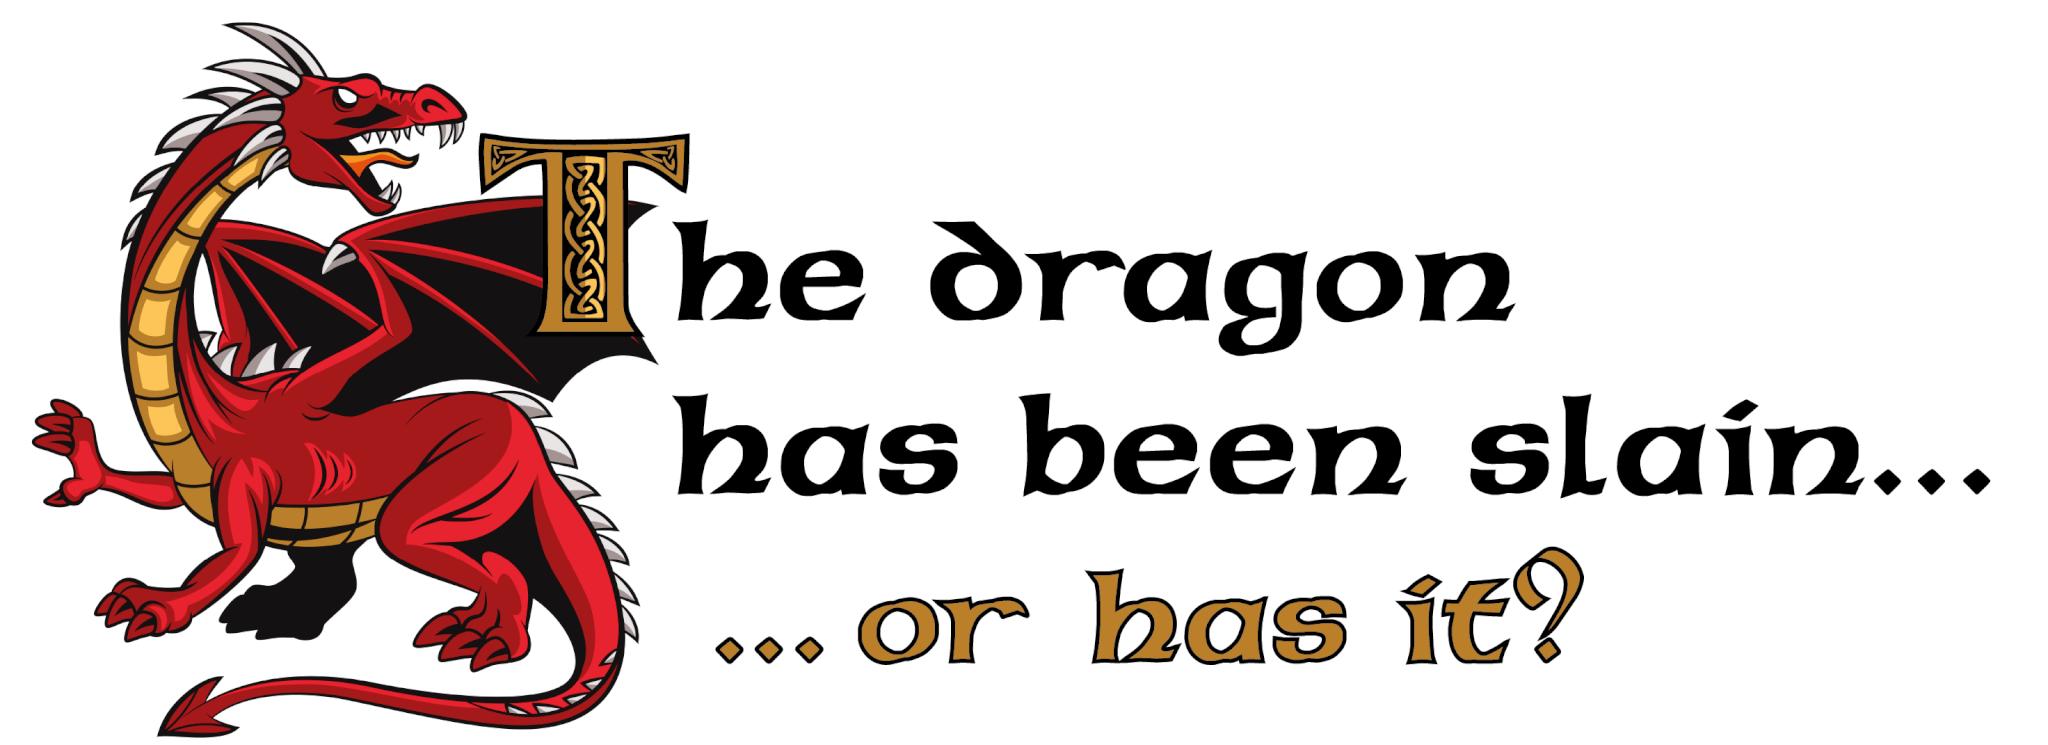 HiLo_Agency_Blog_EN_stage_fright_dragon